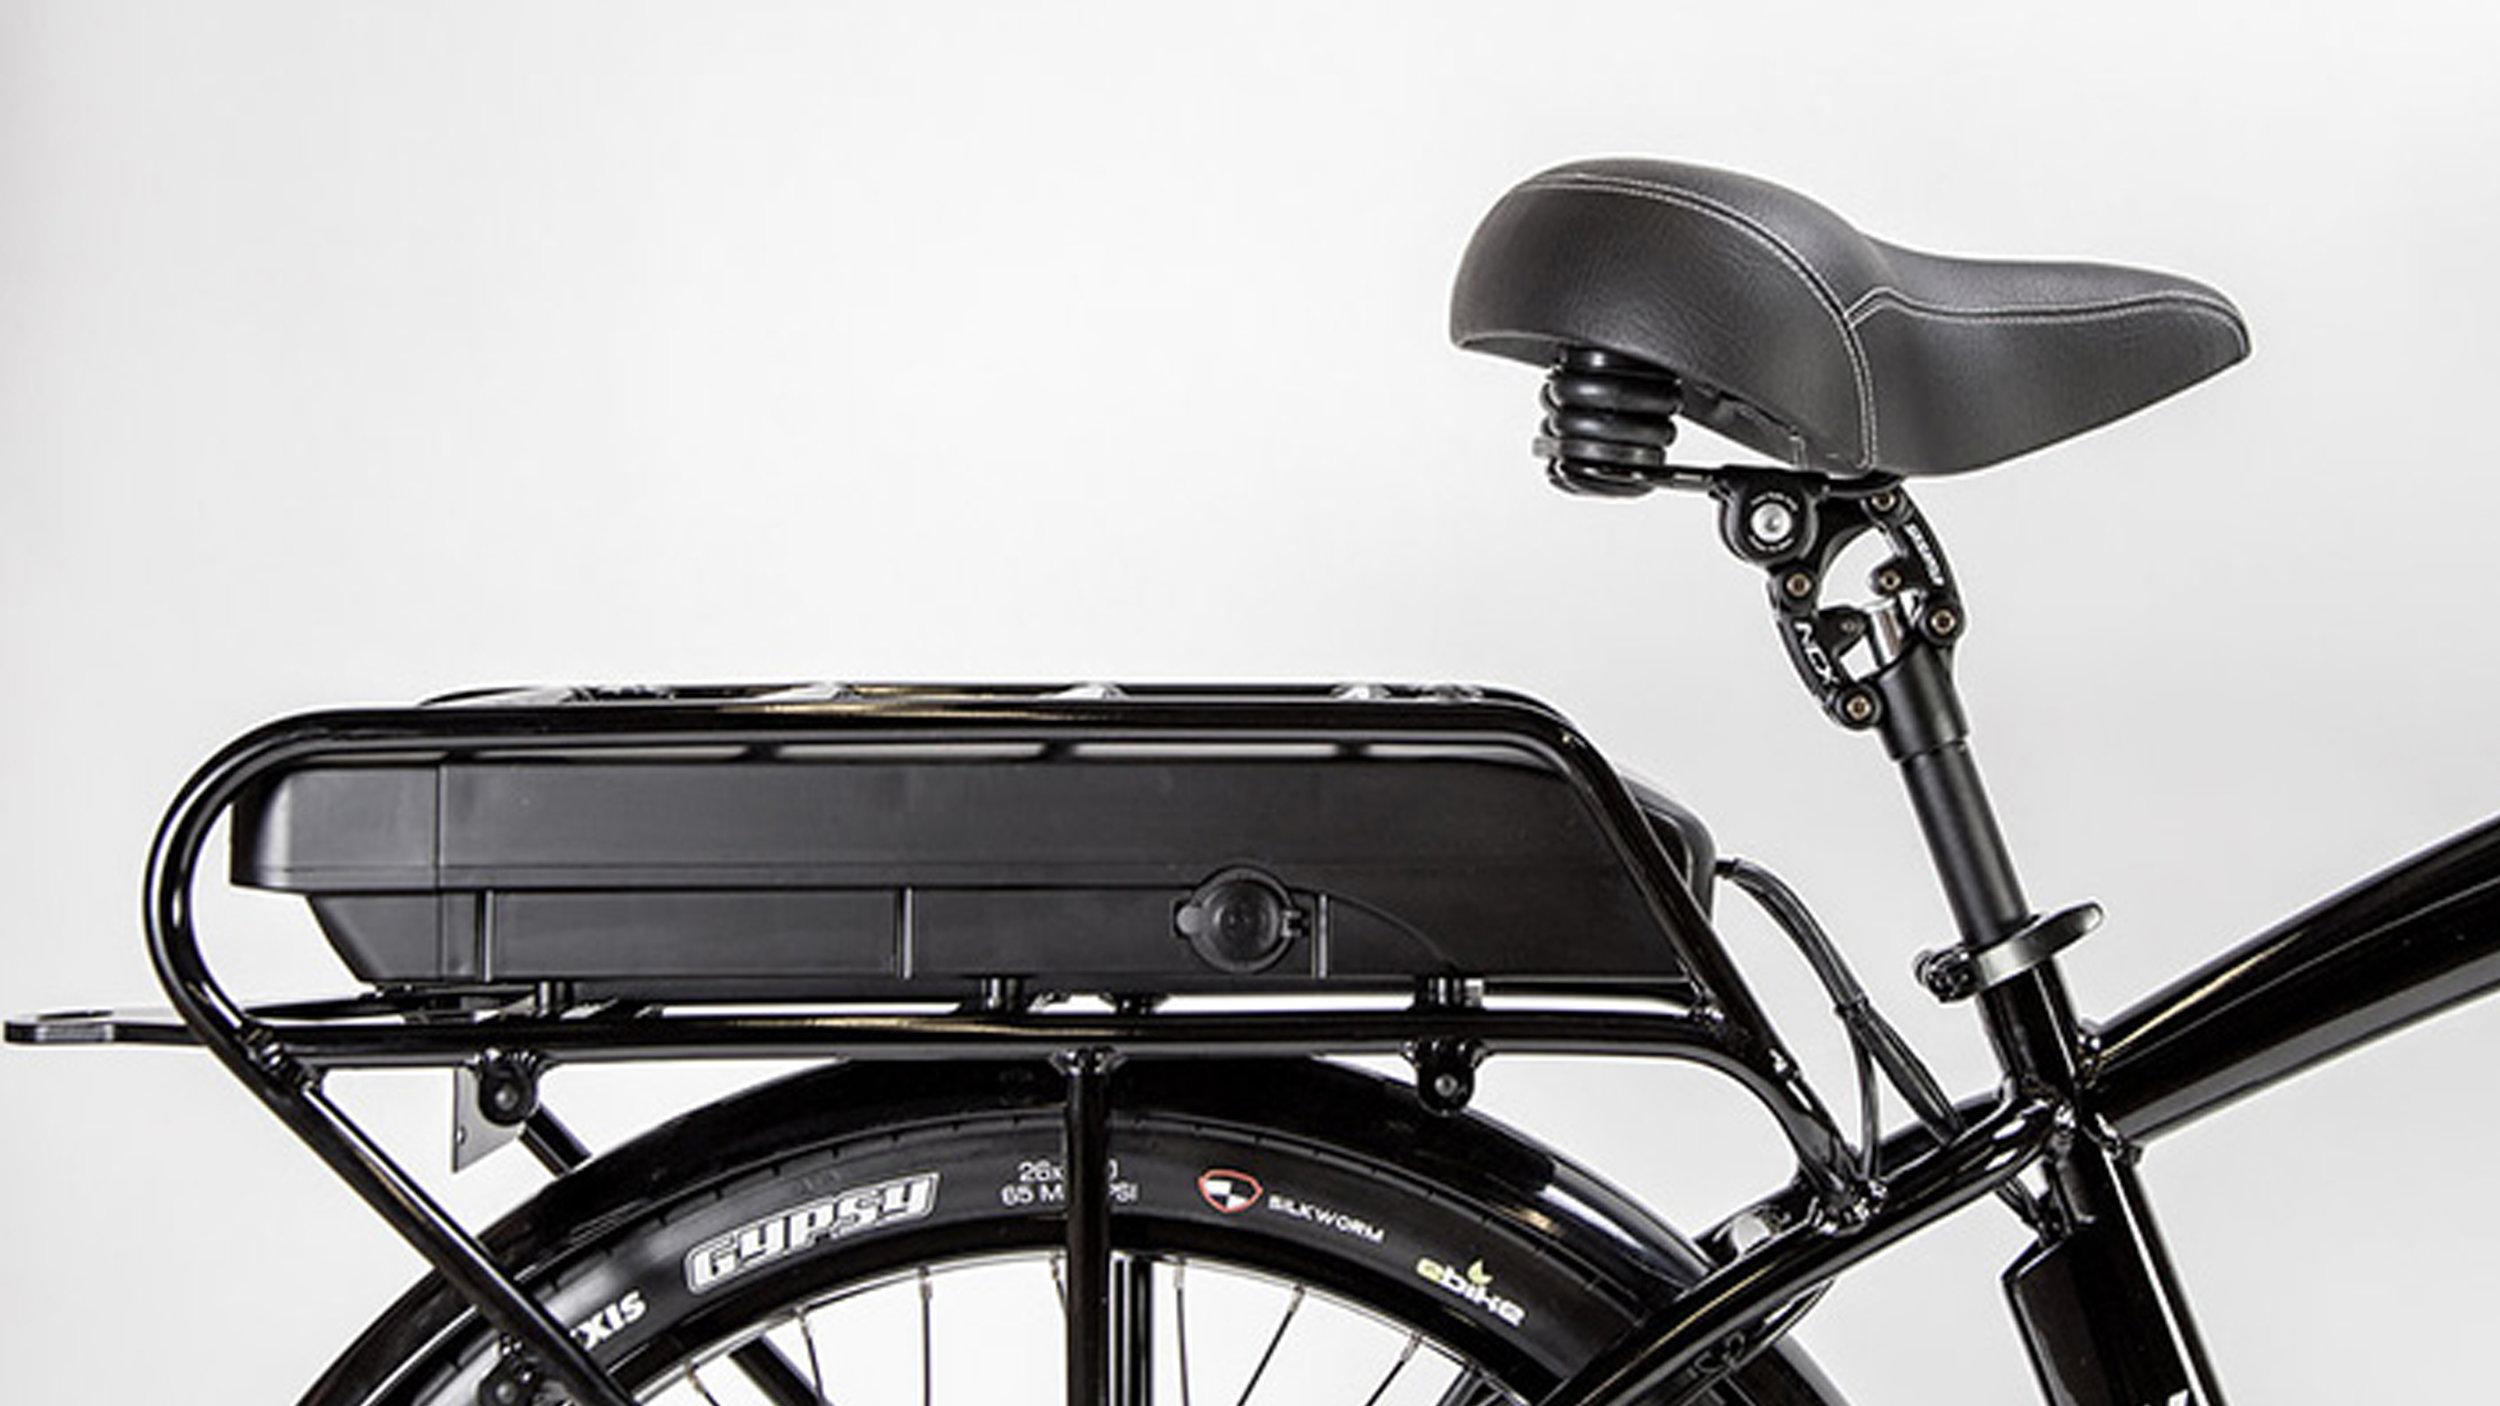 electrified-reviews-electric-bike-company-model-c-electric-bike-review-battery.jpg